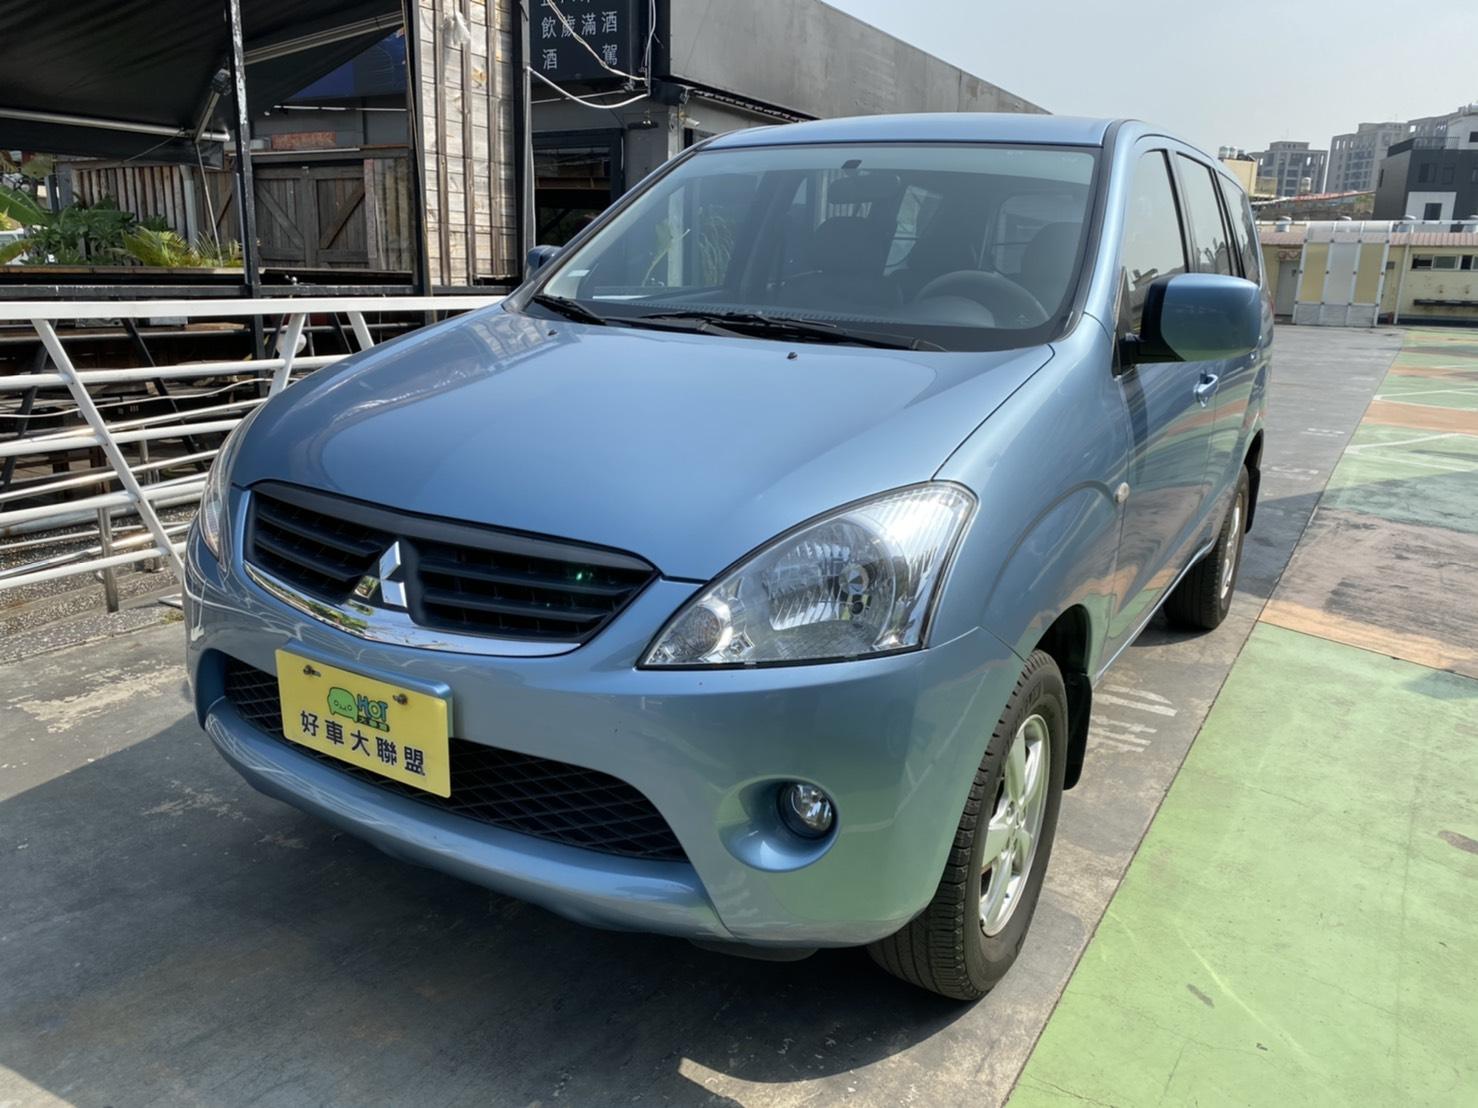 2006 Mitsubishi 三菱 Zinger